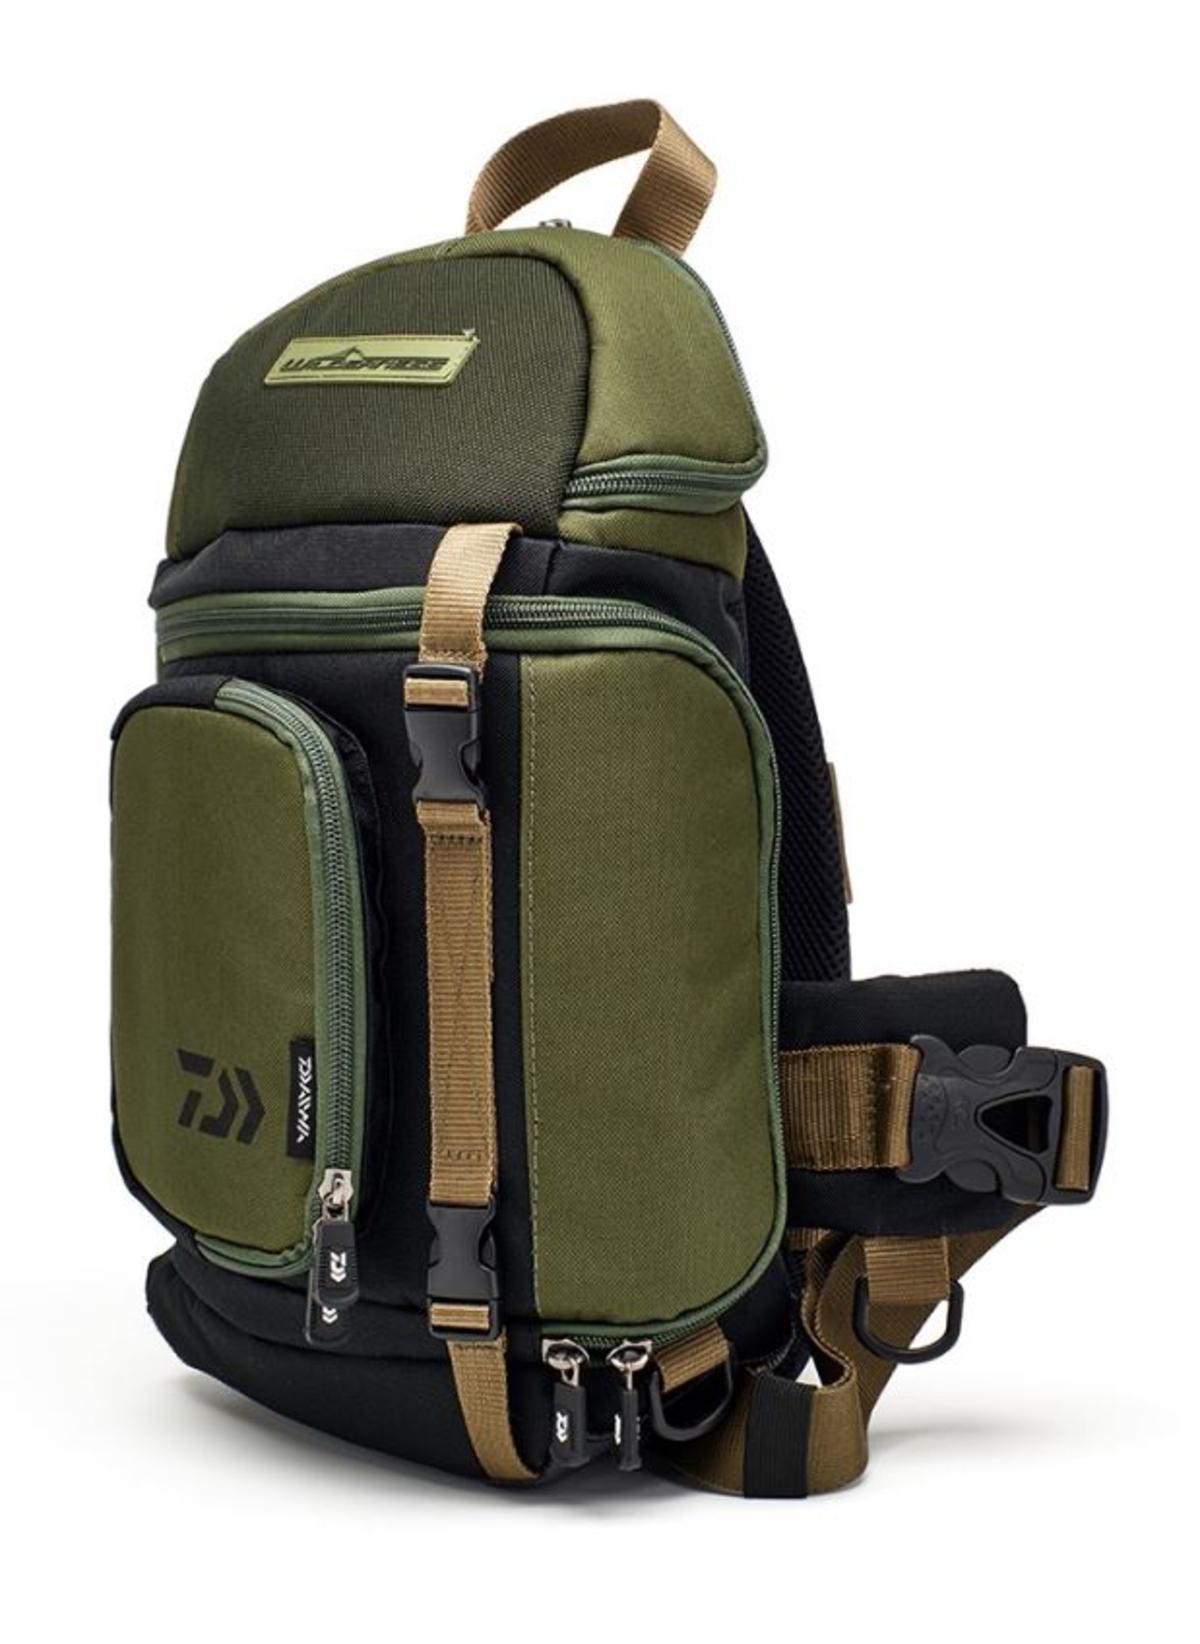 New Daiwa Wilderness Roto Rucksack - DWRRS1